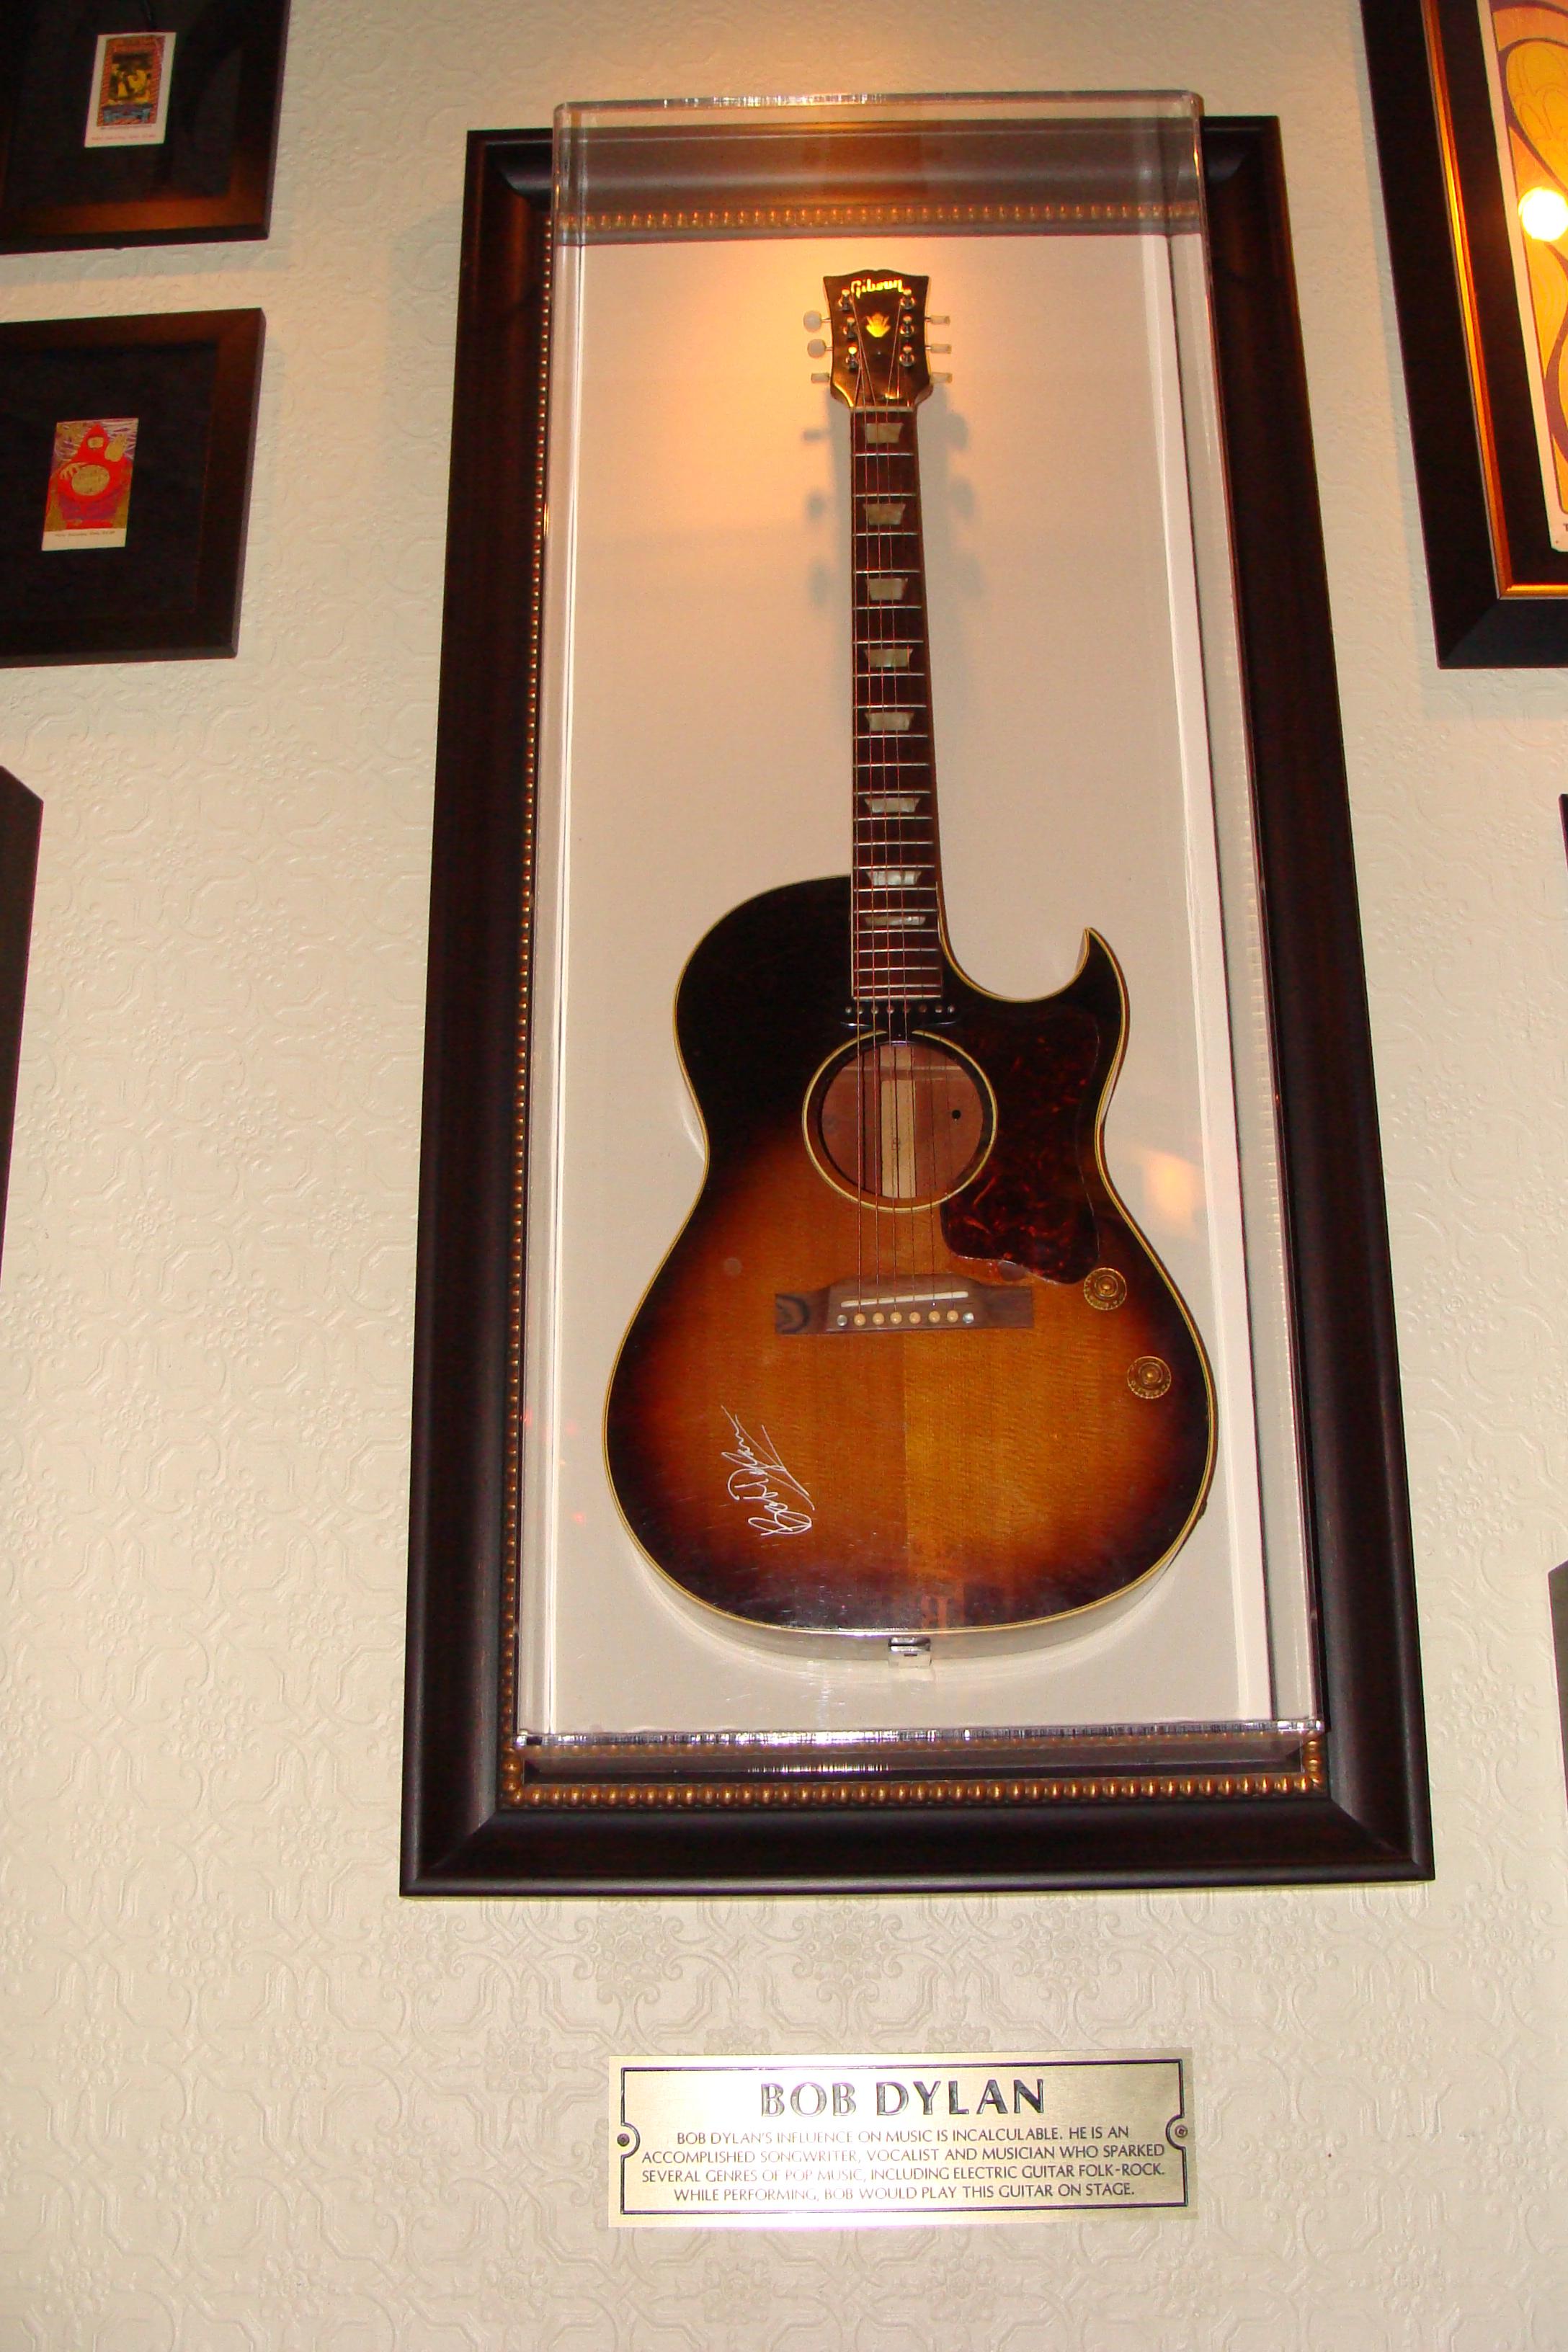 Filebob Dylans Gibson Guitar Hardrock Cafe Niagara